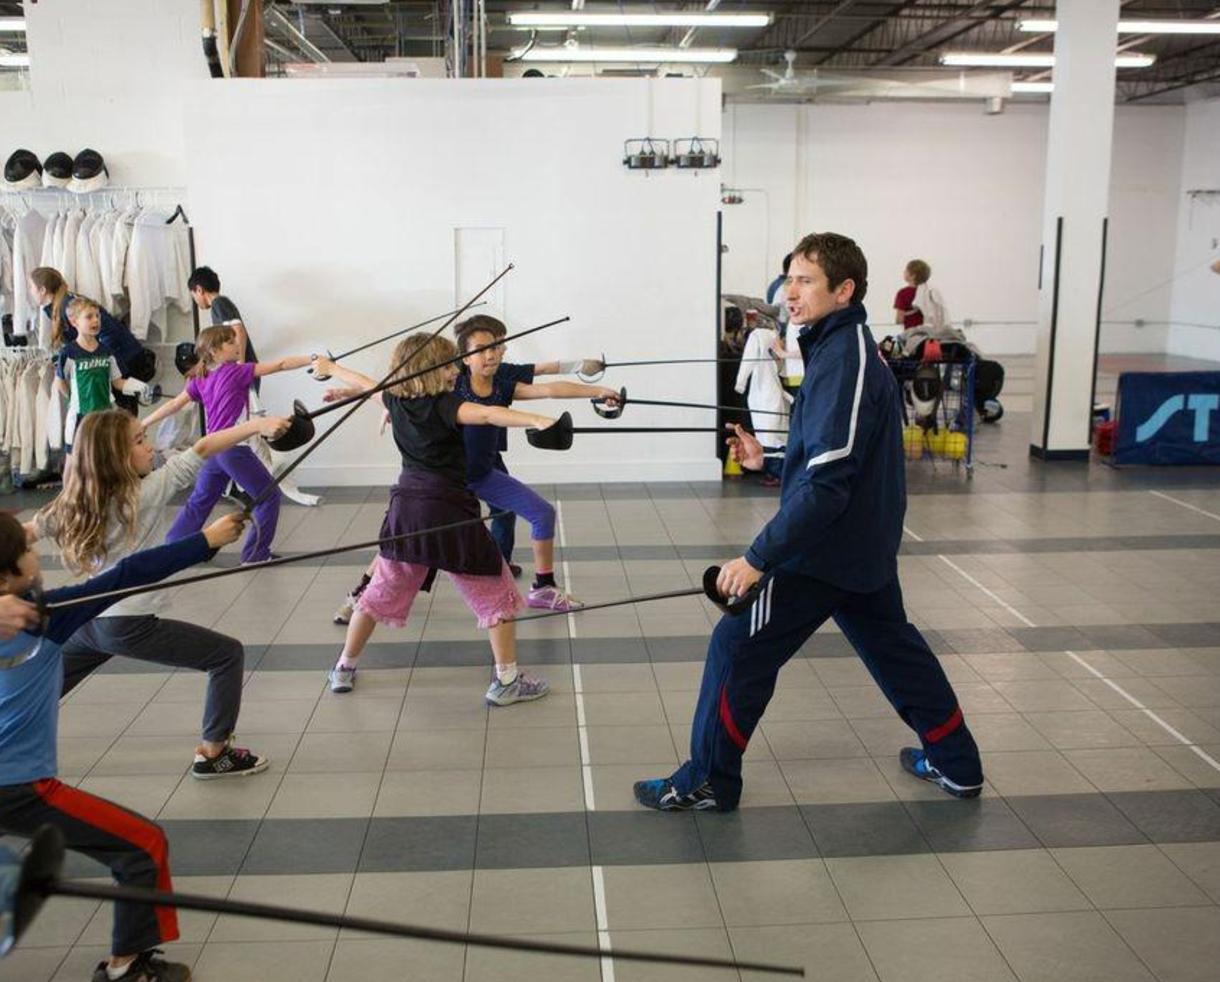 Capital Fencing Academy Beginner Fencing Course